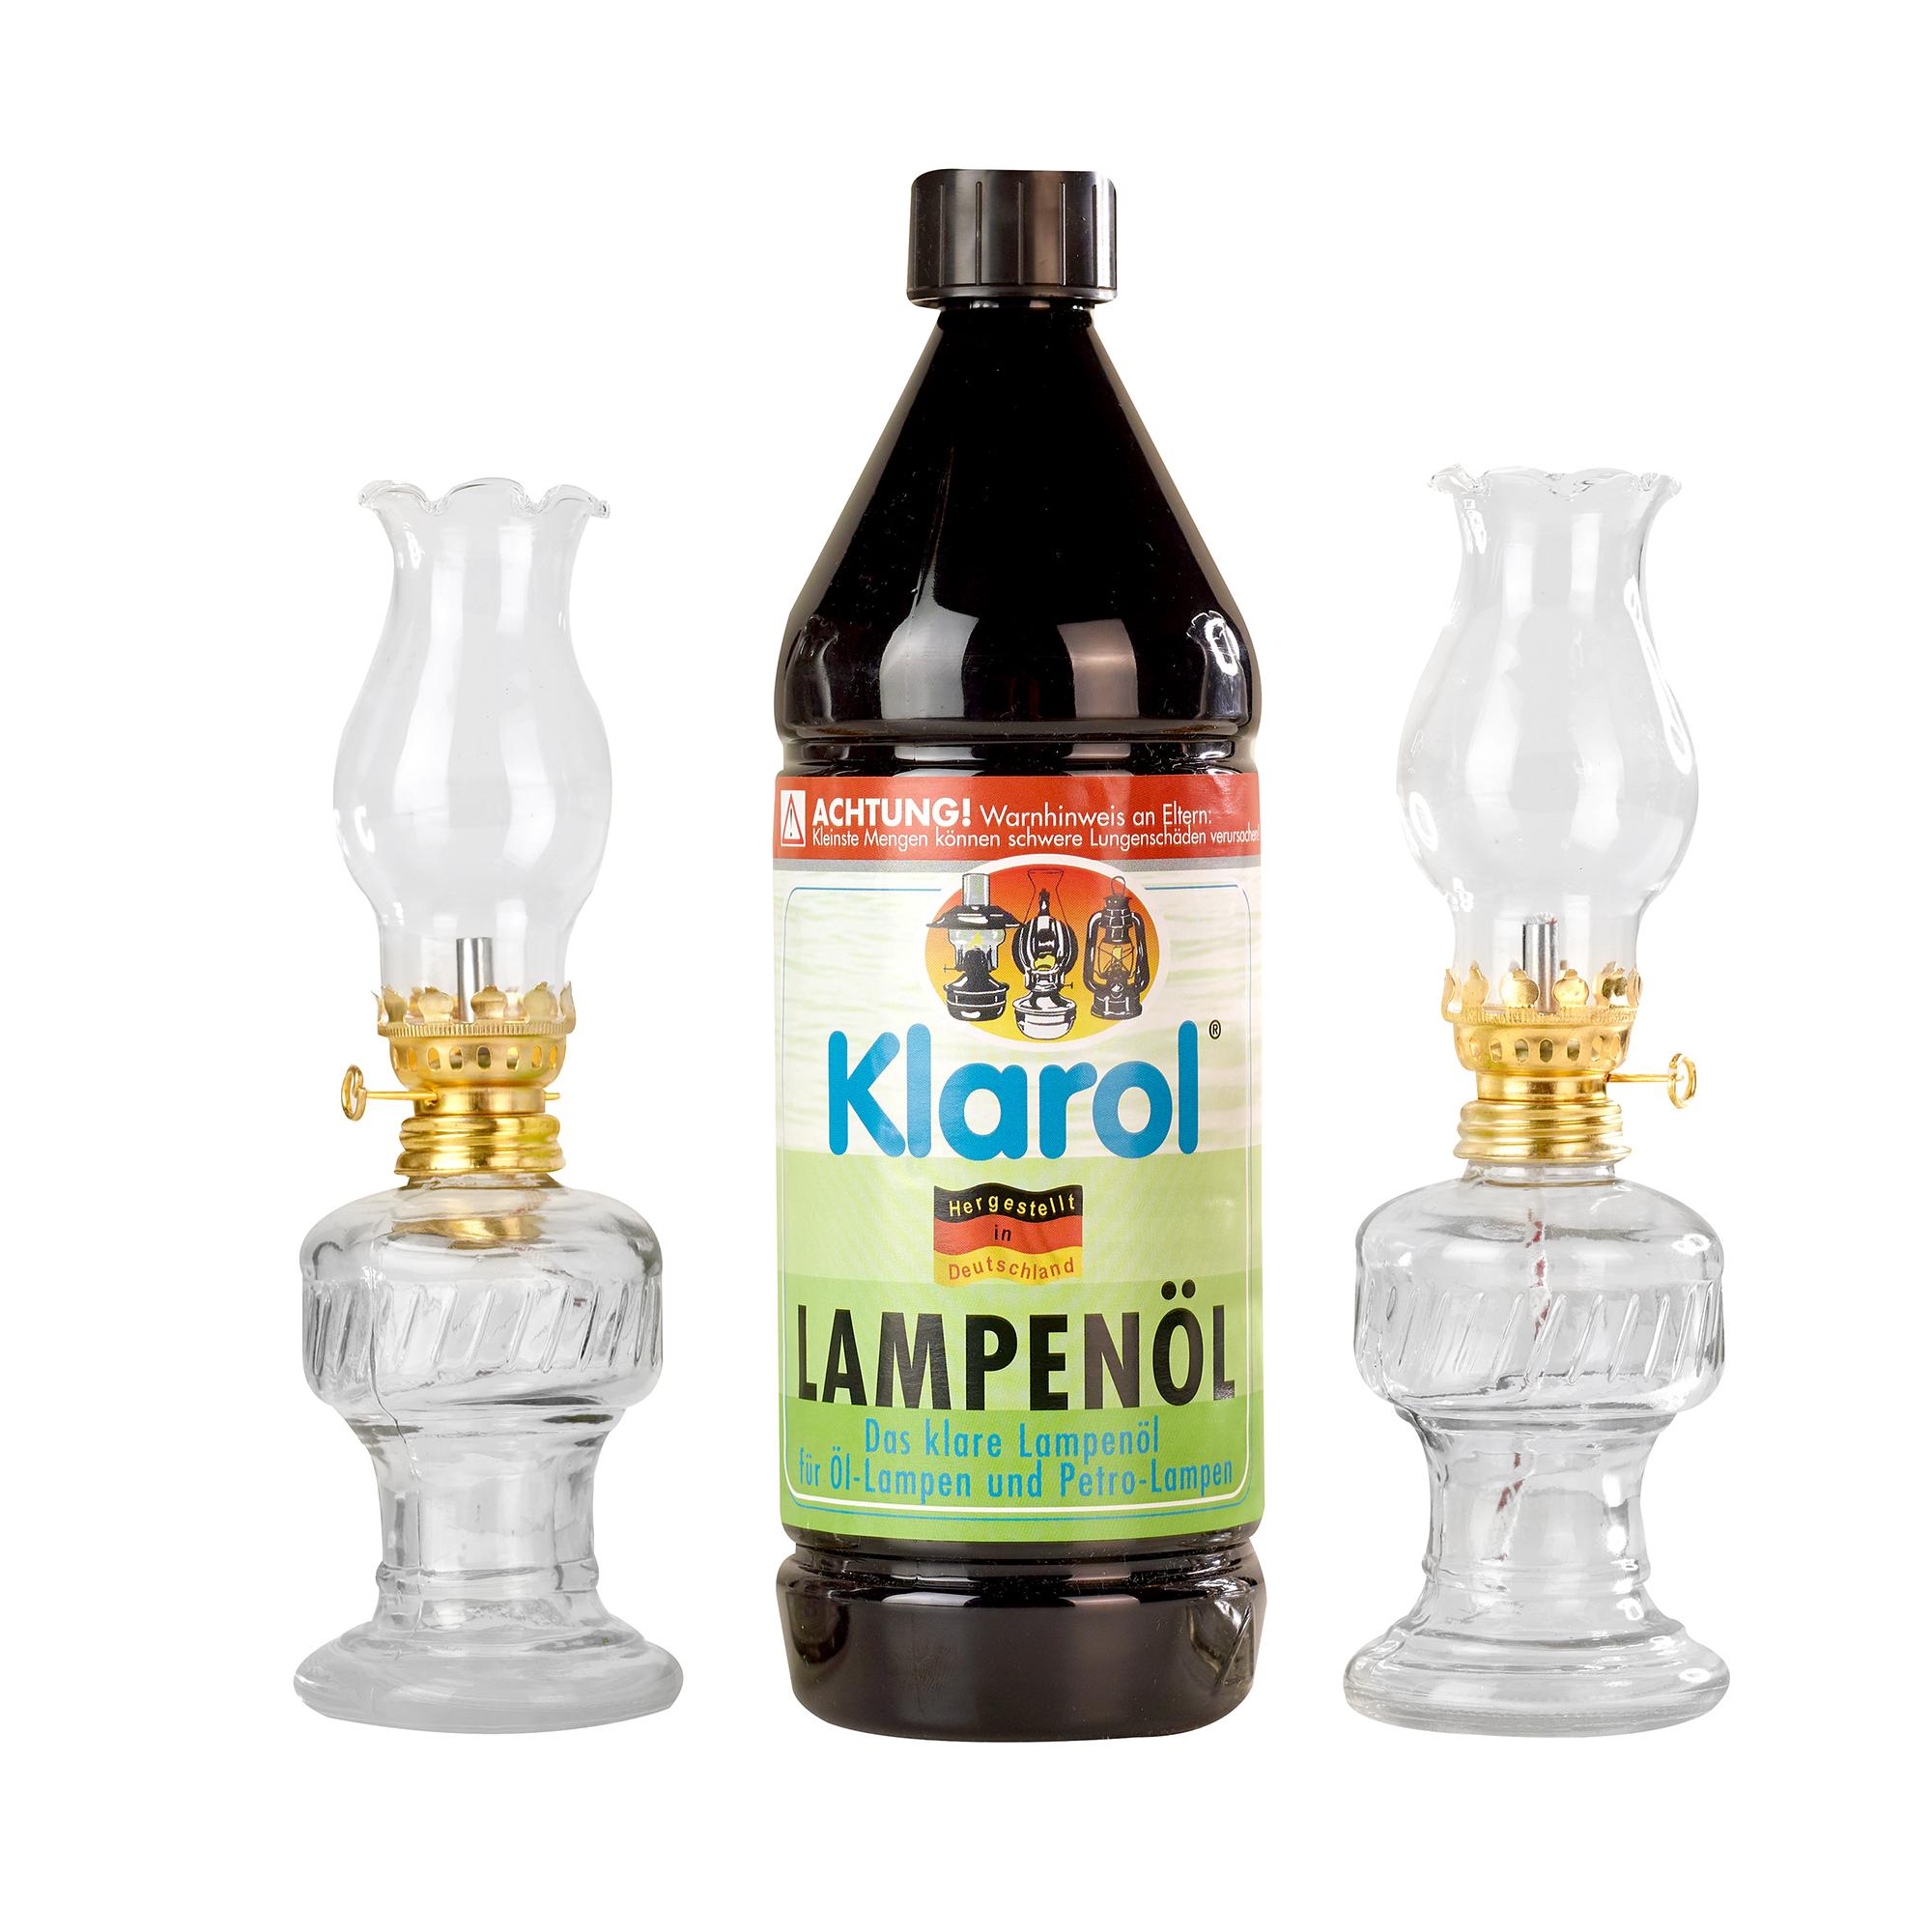 2x Öllampe aus Glas, 21 cm im Set mit Karol Lampenöl 1ltr.